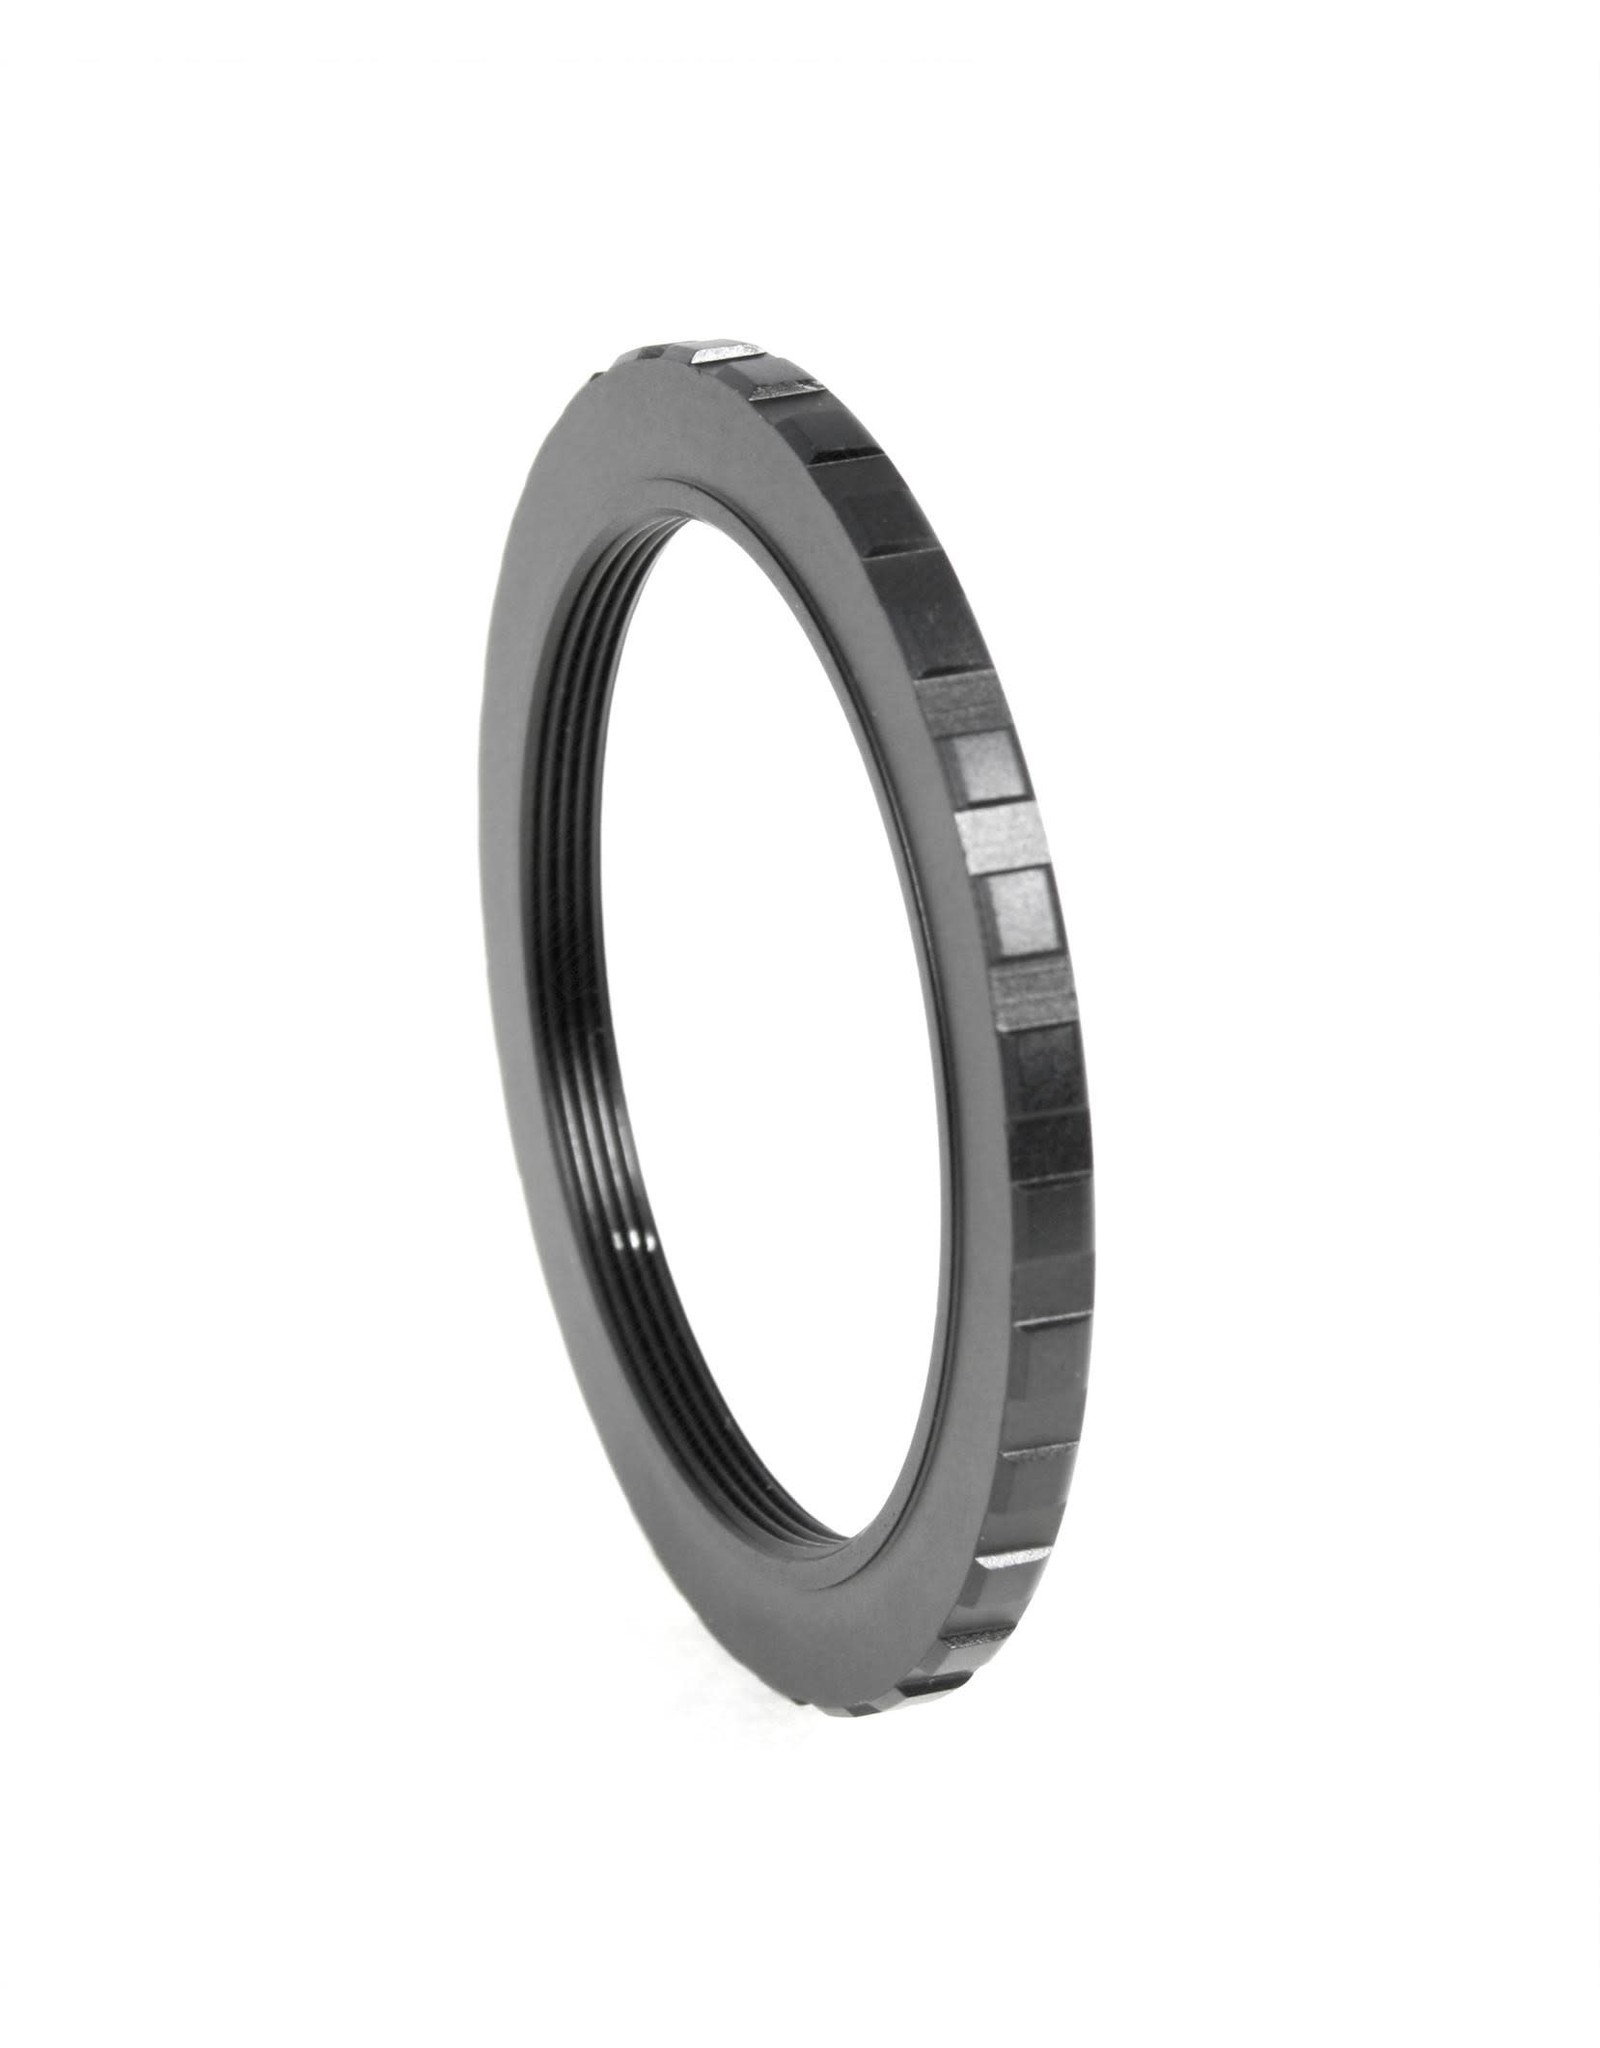 Baader Planetarium Baader T-2 Locking Ring with female T-2 thread